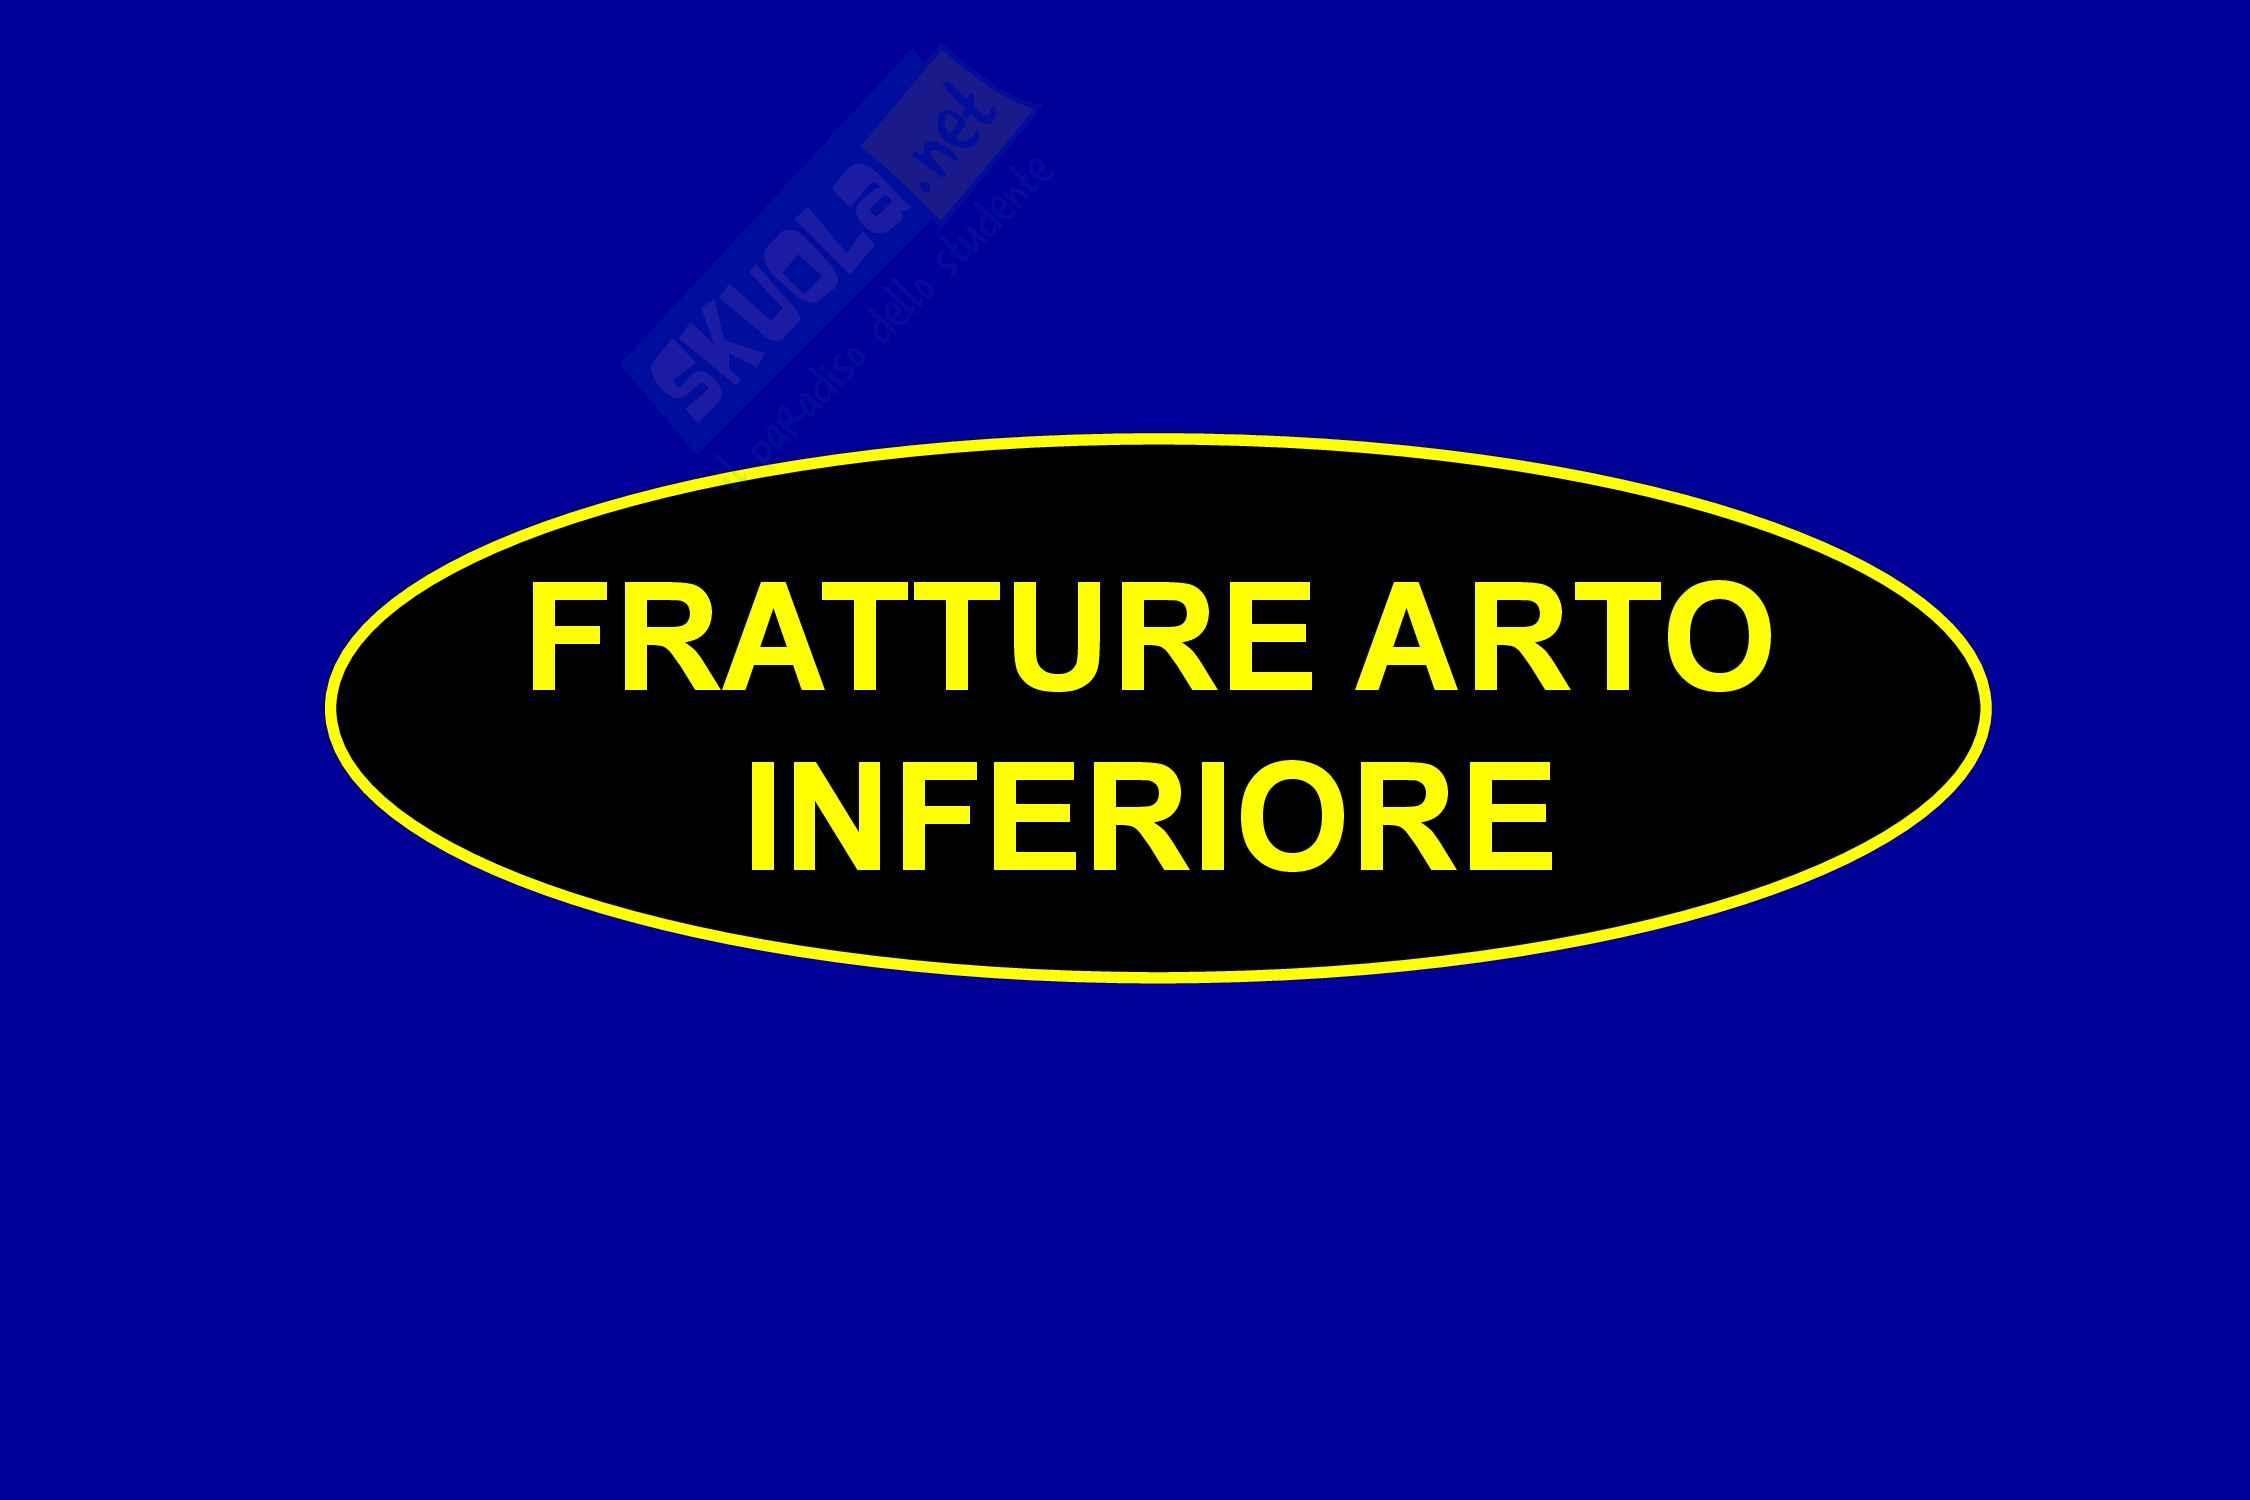 Ortopedia - Fratture arti inferiori